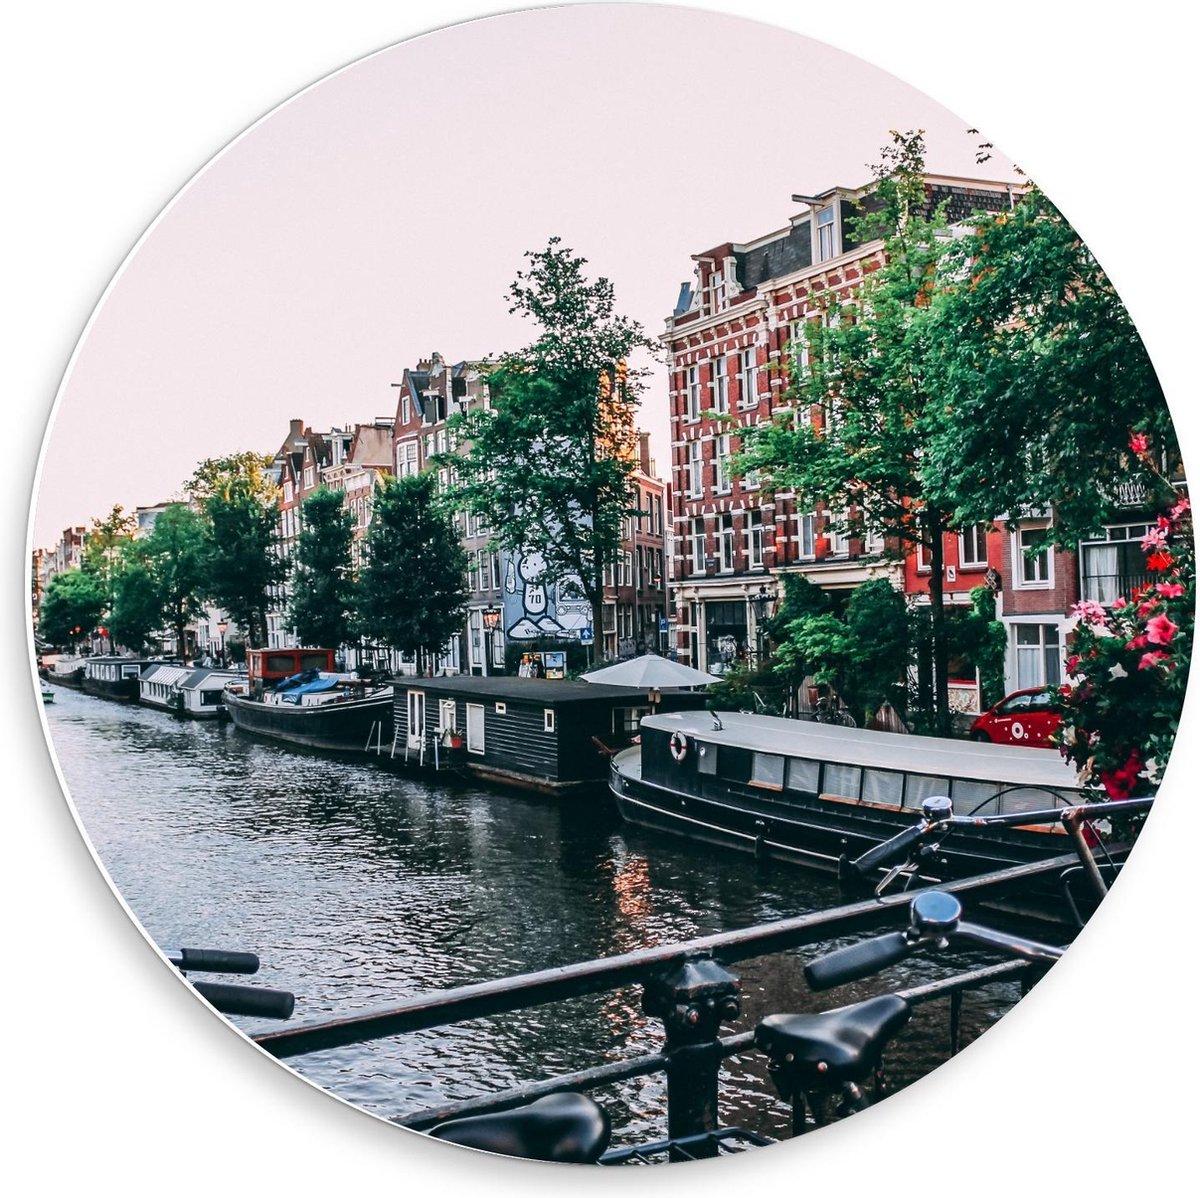 Forex Wandcirkel - Amsterdamse Grachten - 50x50cm Foto op Wandcirkel (met ophangsysteem)